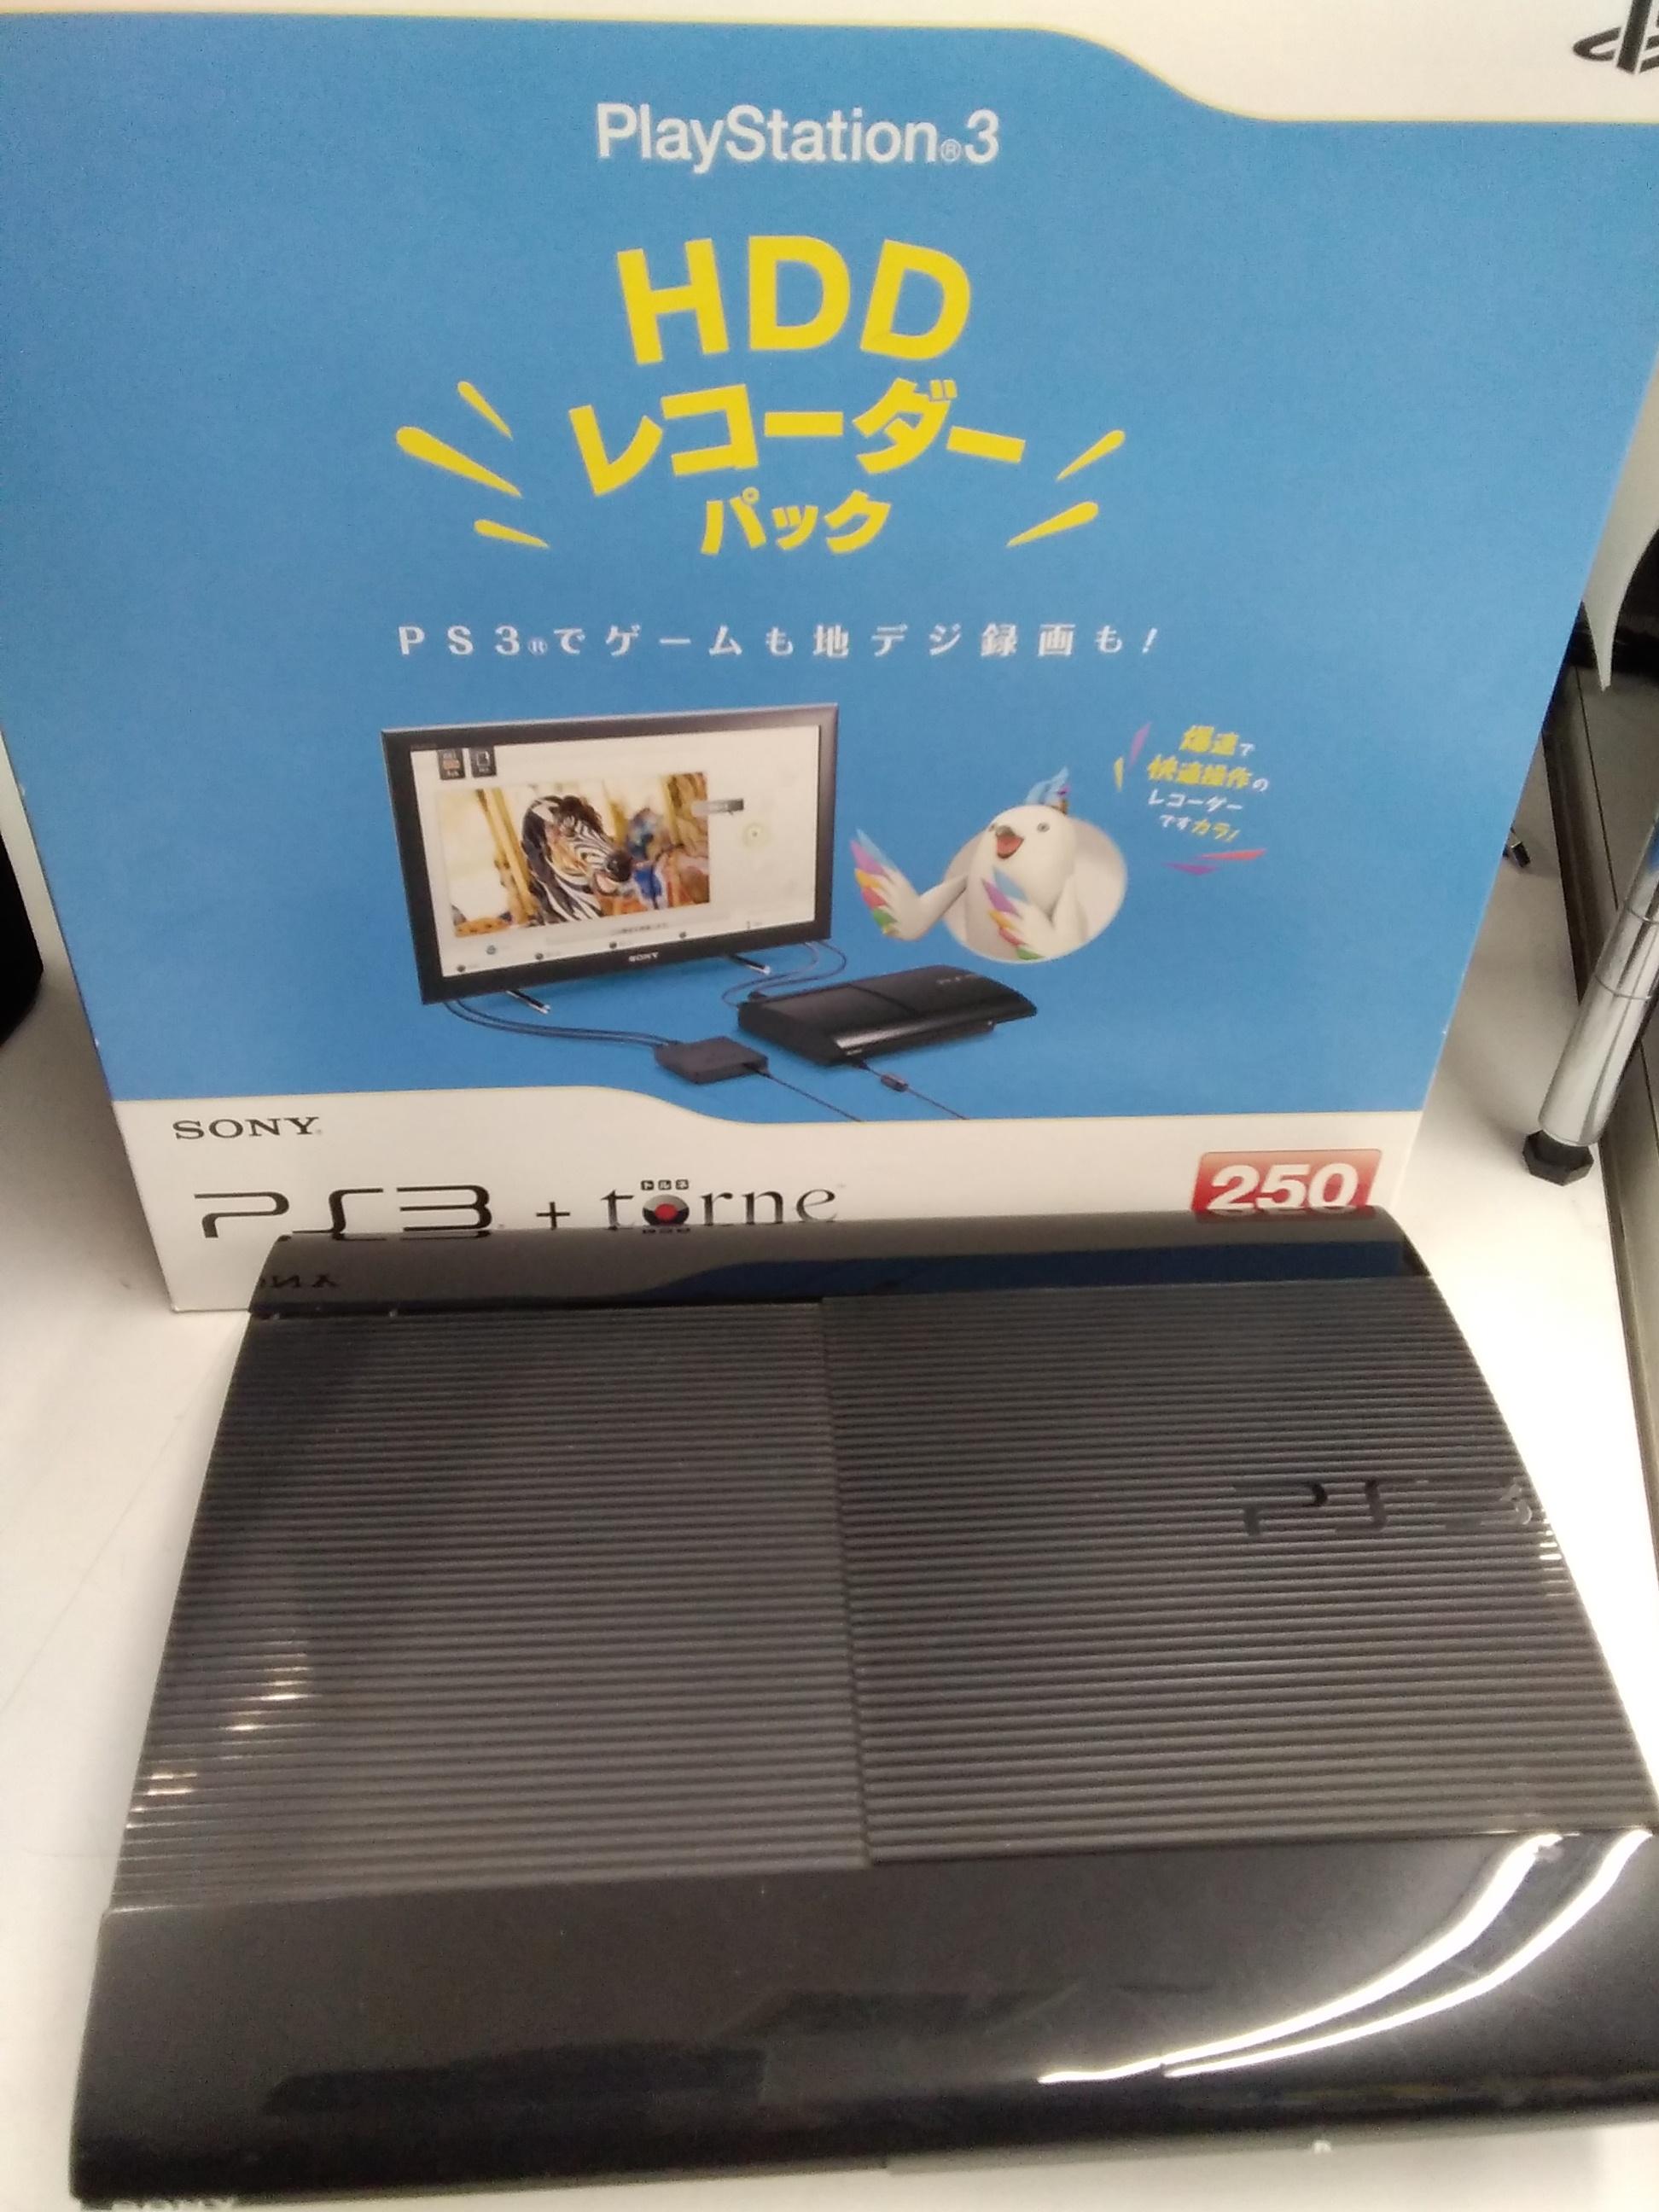 CEJH-10025/PS3 HDDレコーダーパック|SONY